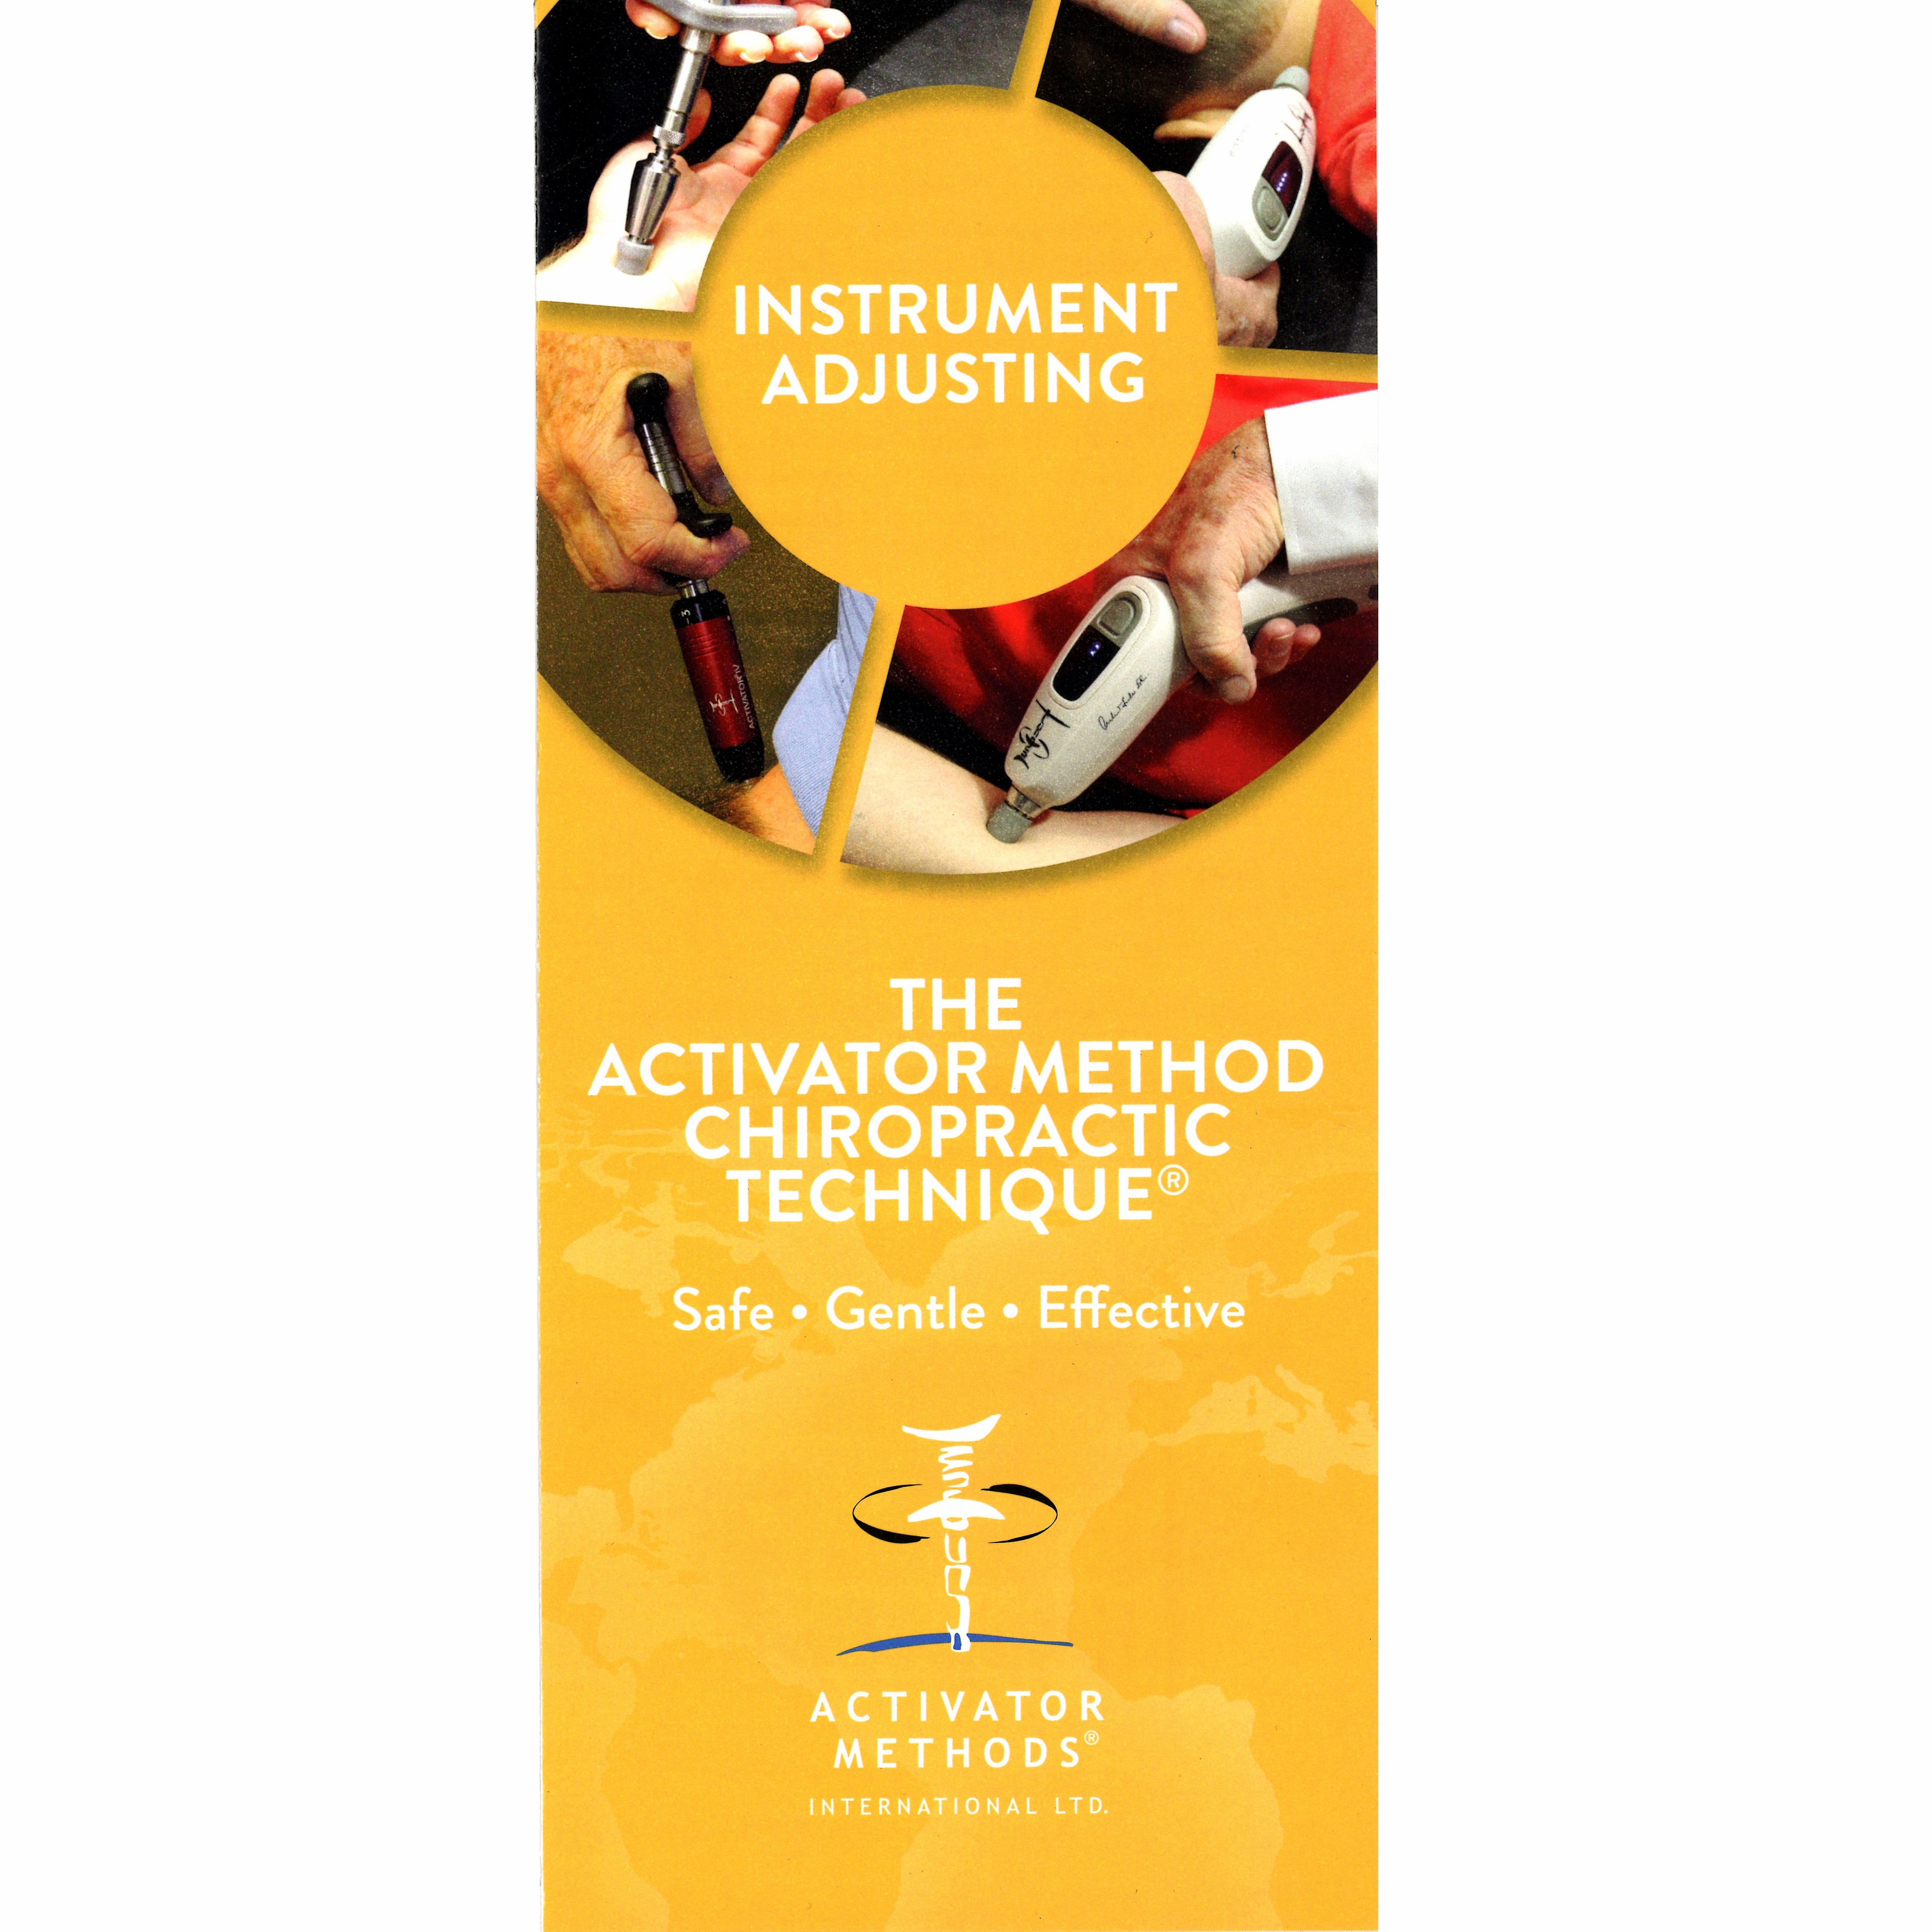 activator methods phoenix az